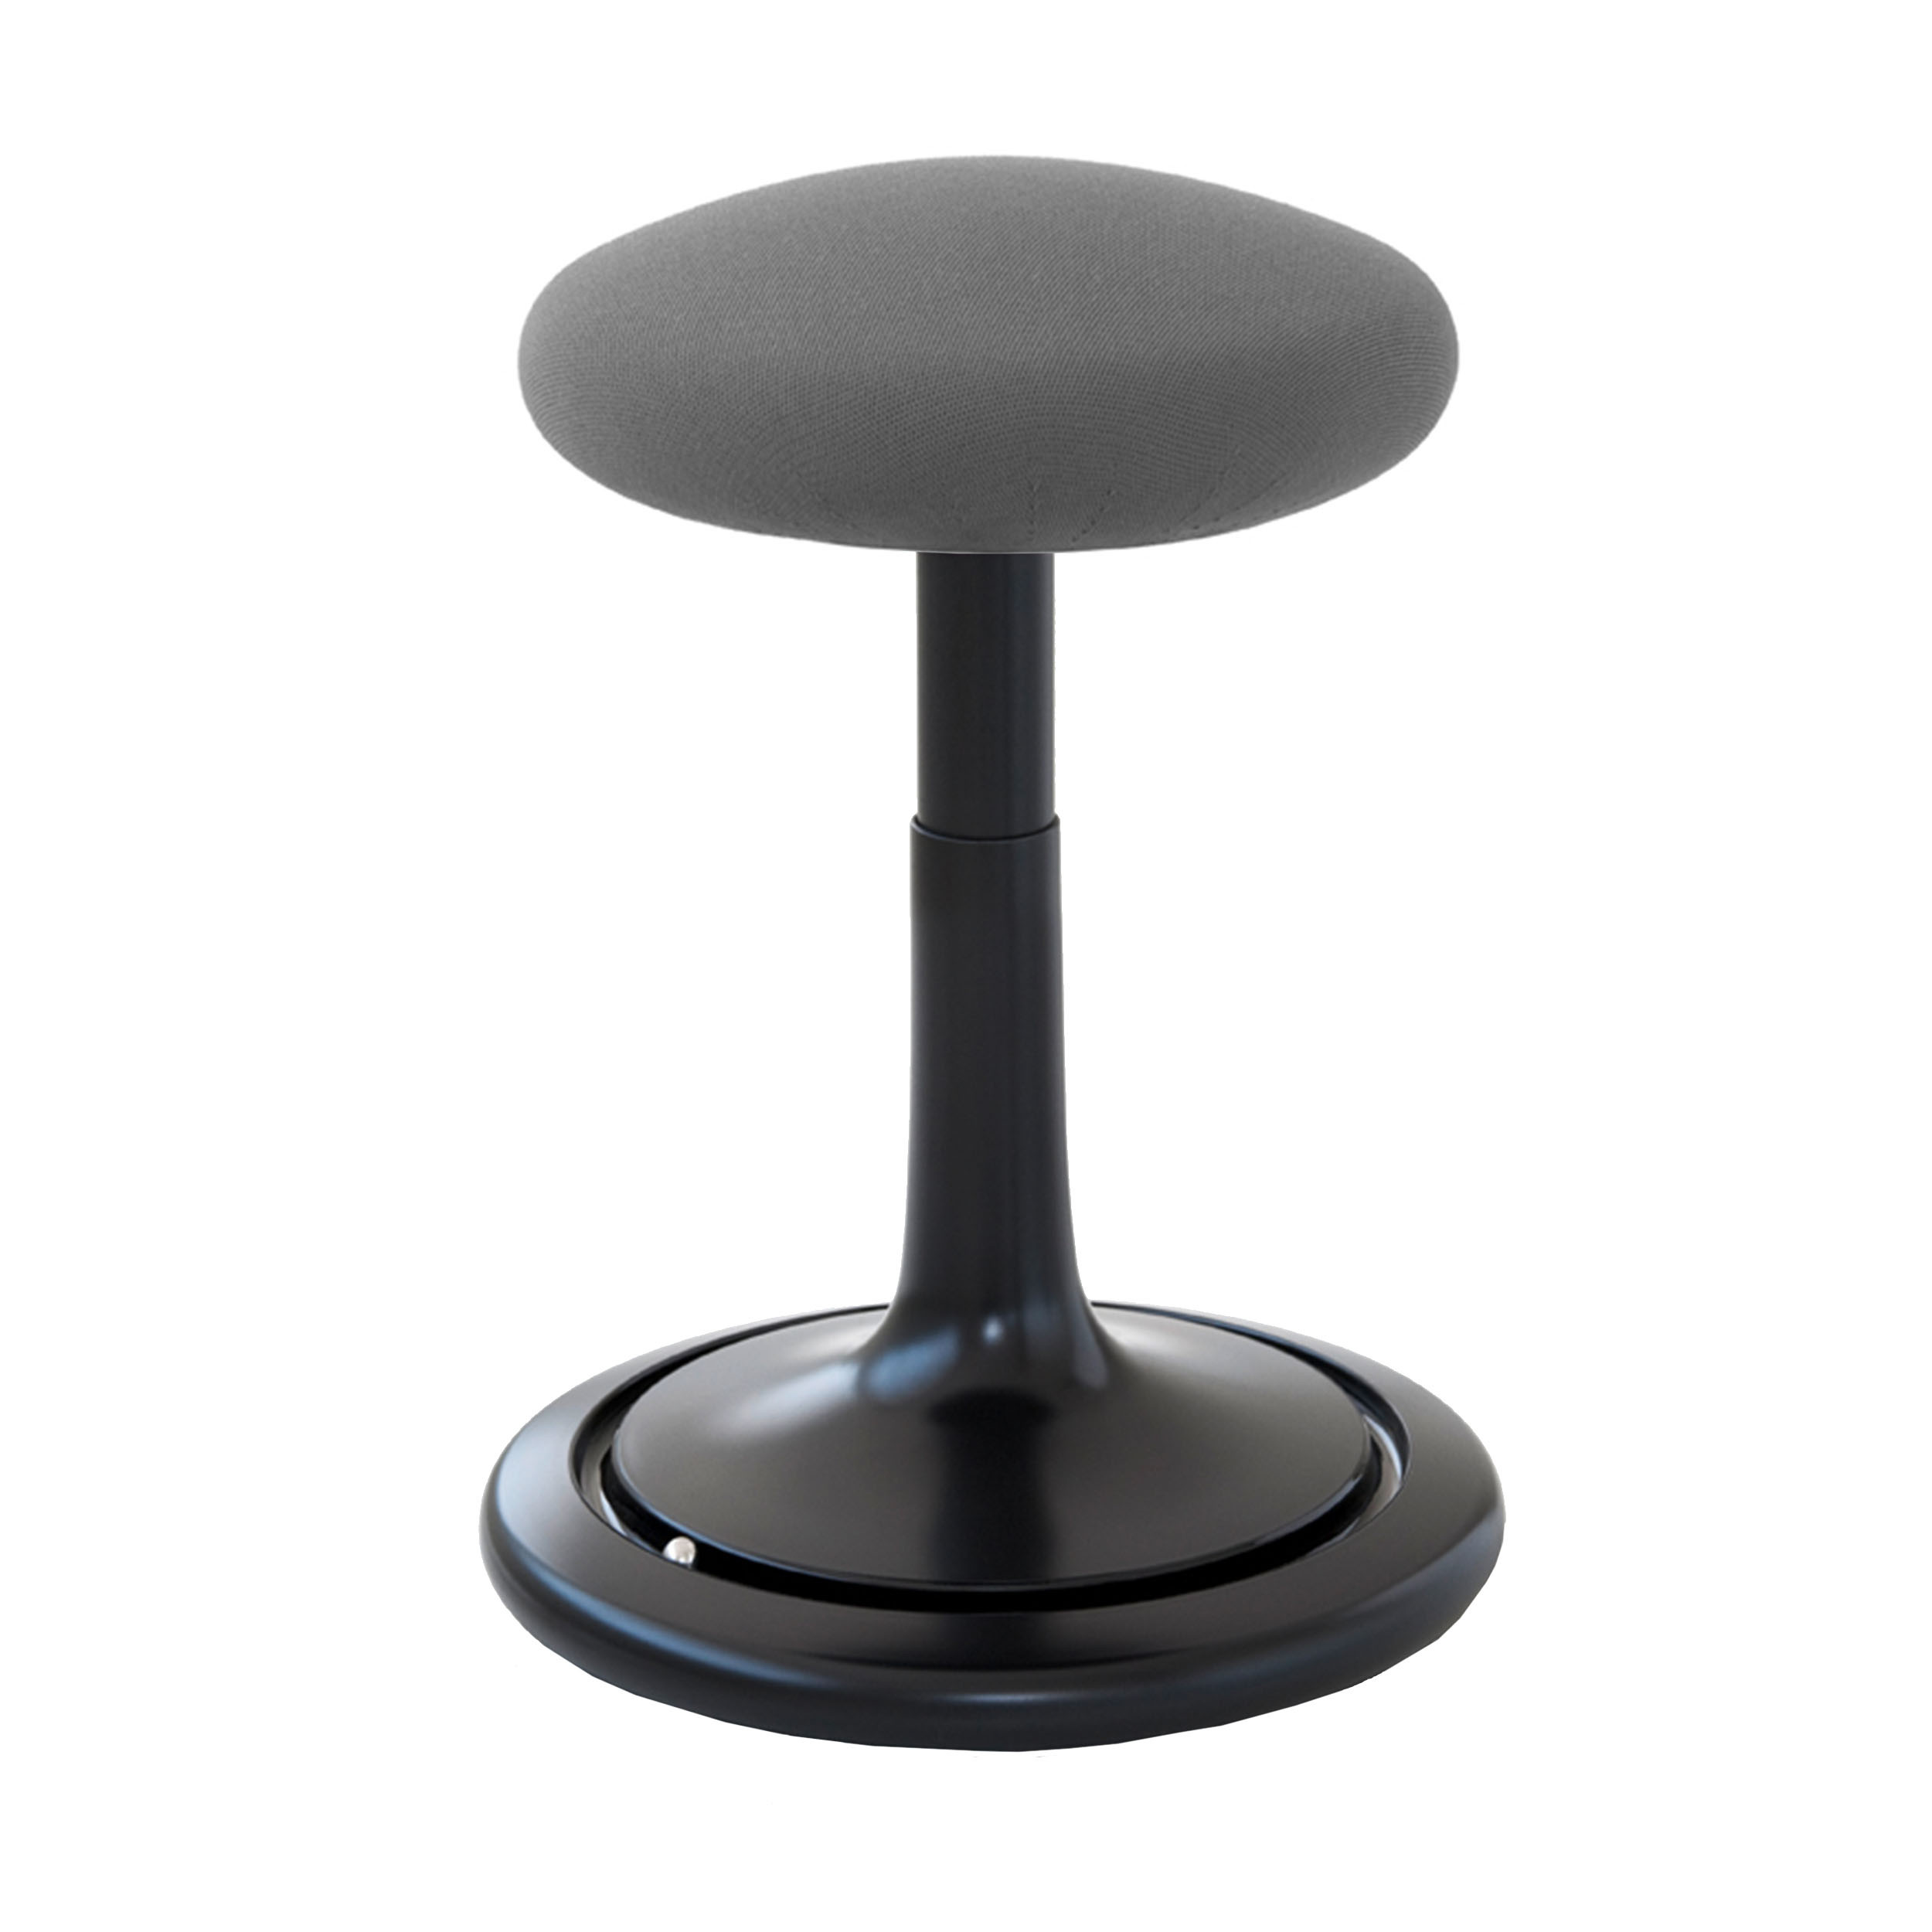 ongo classic ergonomischer hocker mit feedback a045284. Black Bedroom Furniture Sets. Home Design Ideas